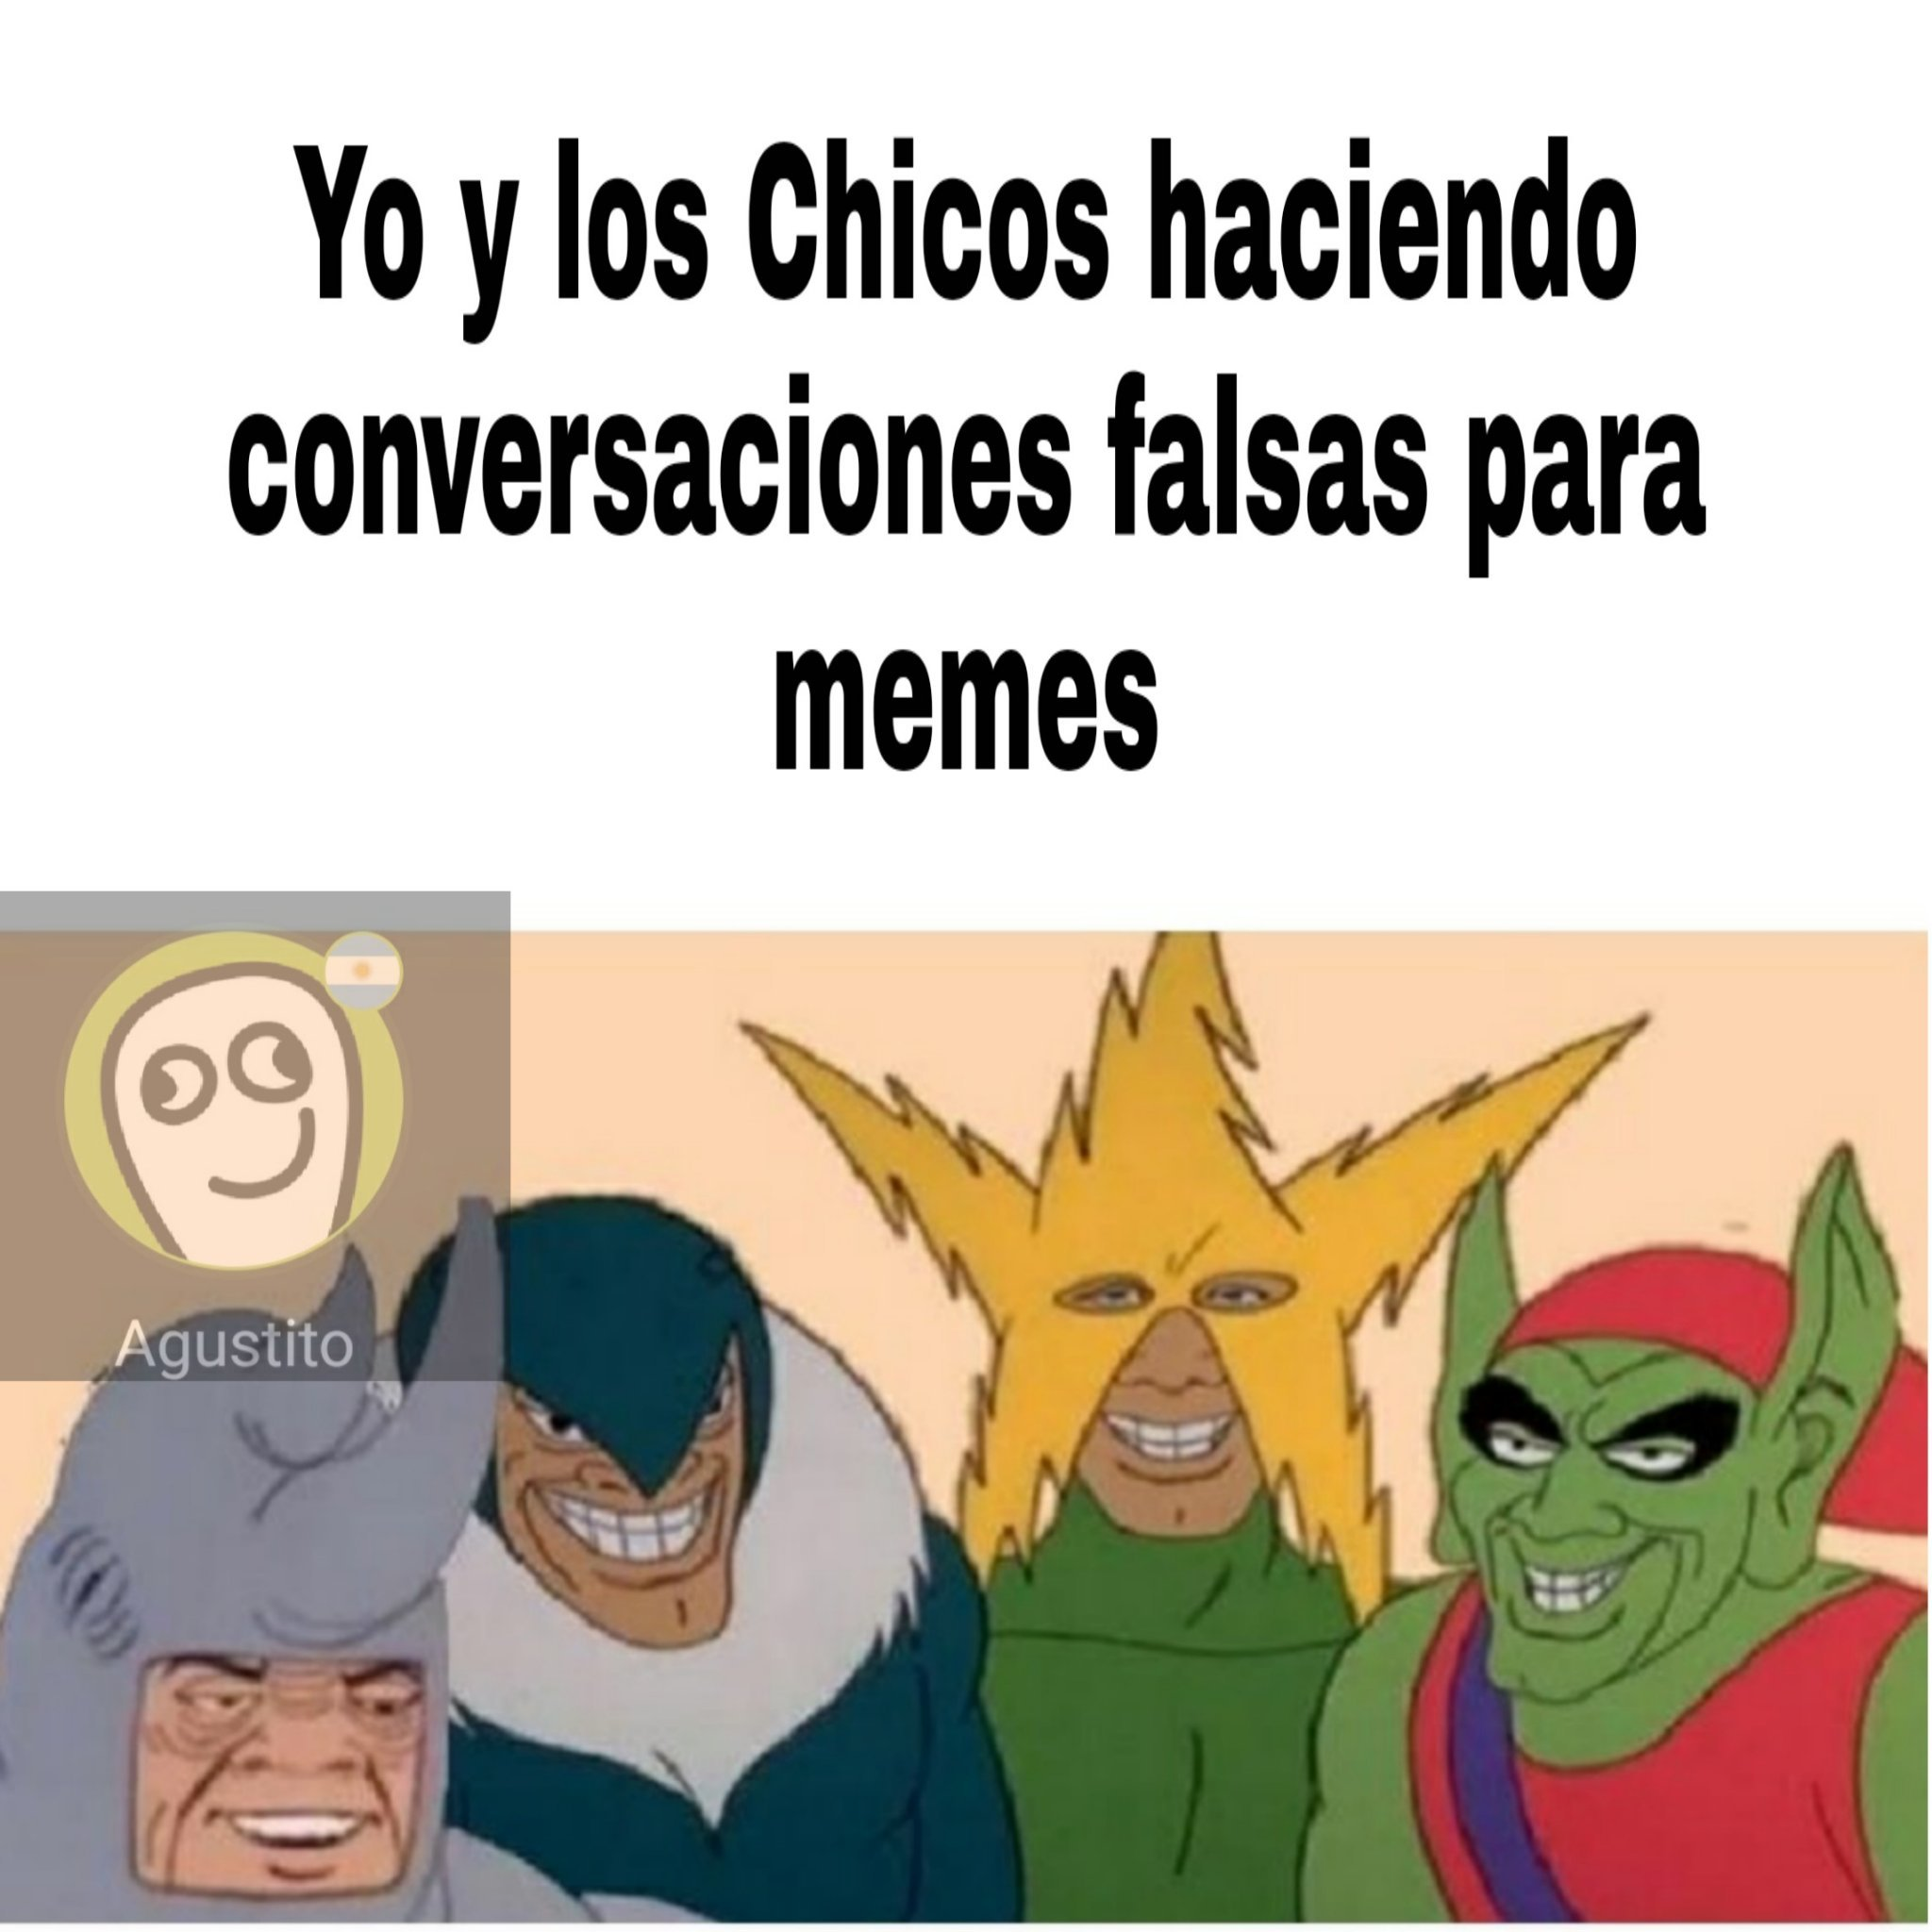 Los pibes - meme